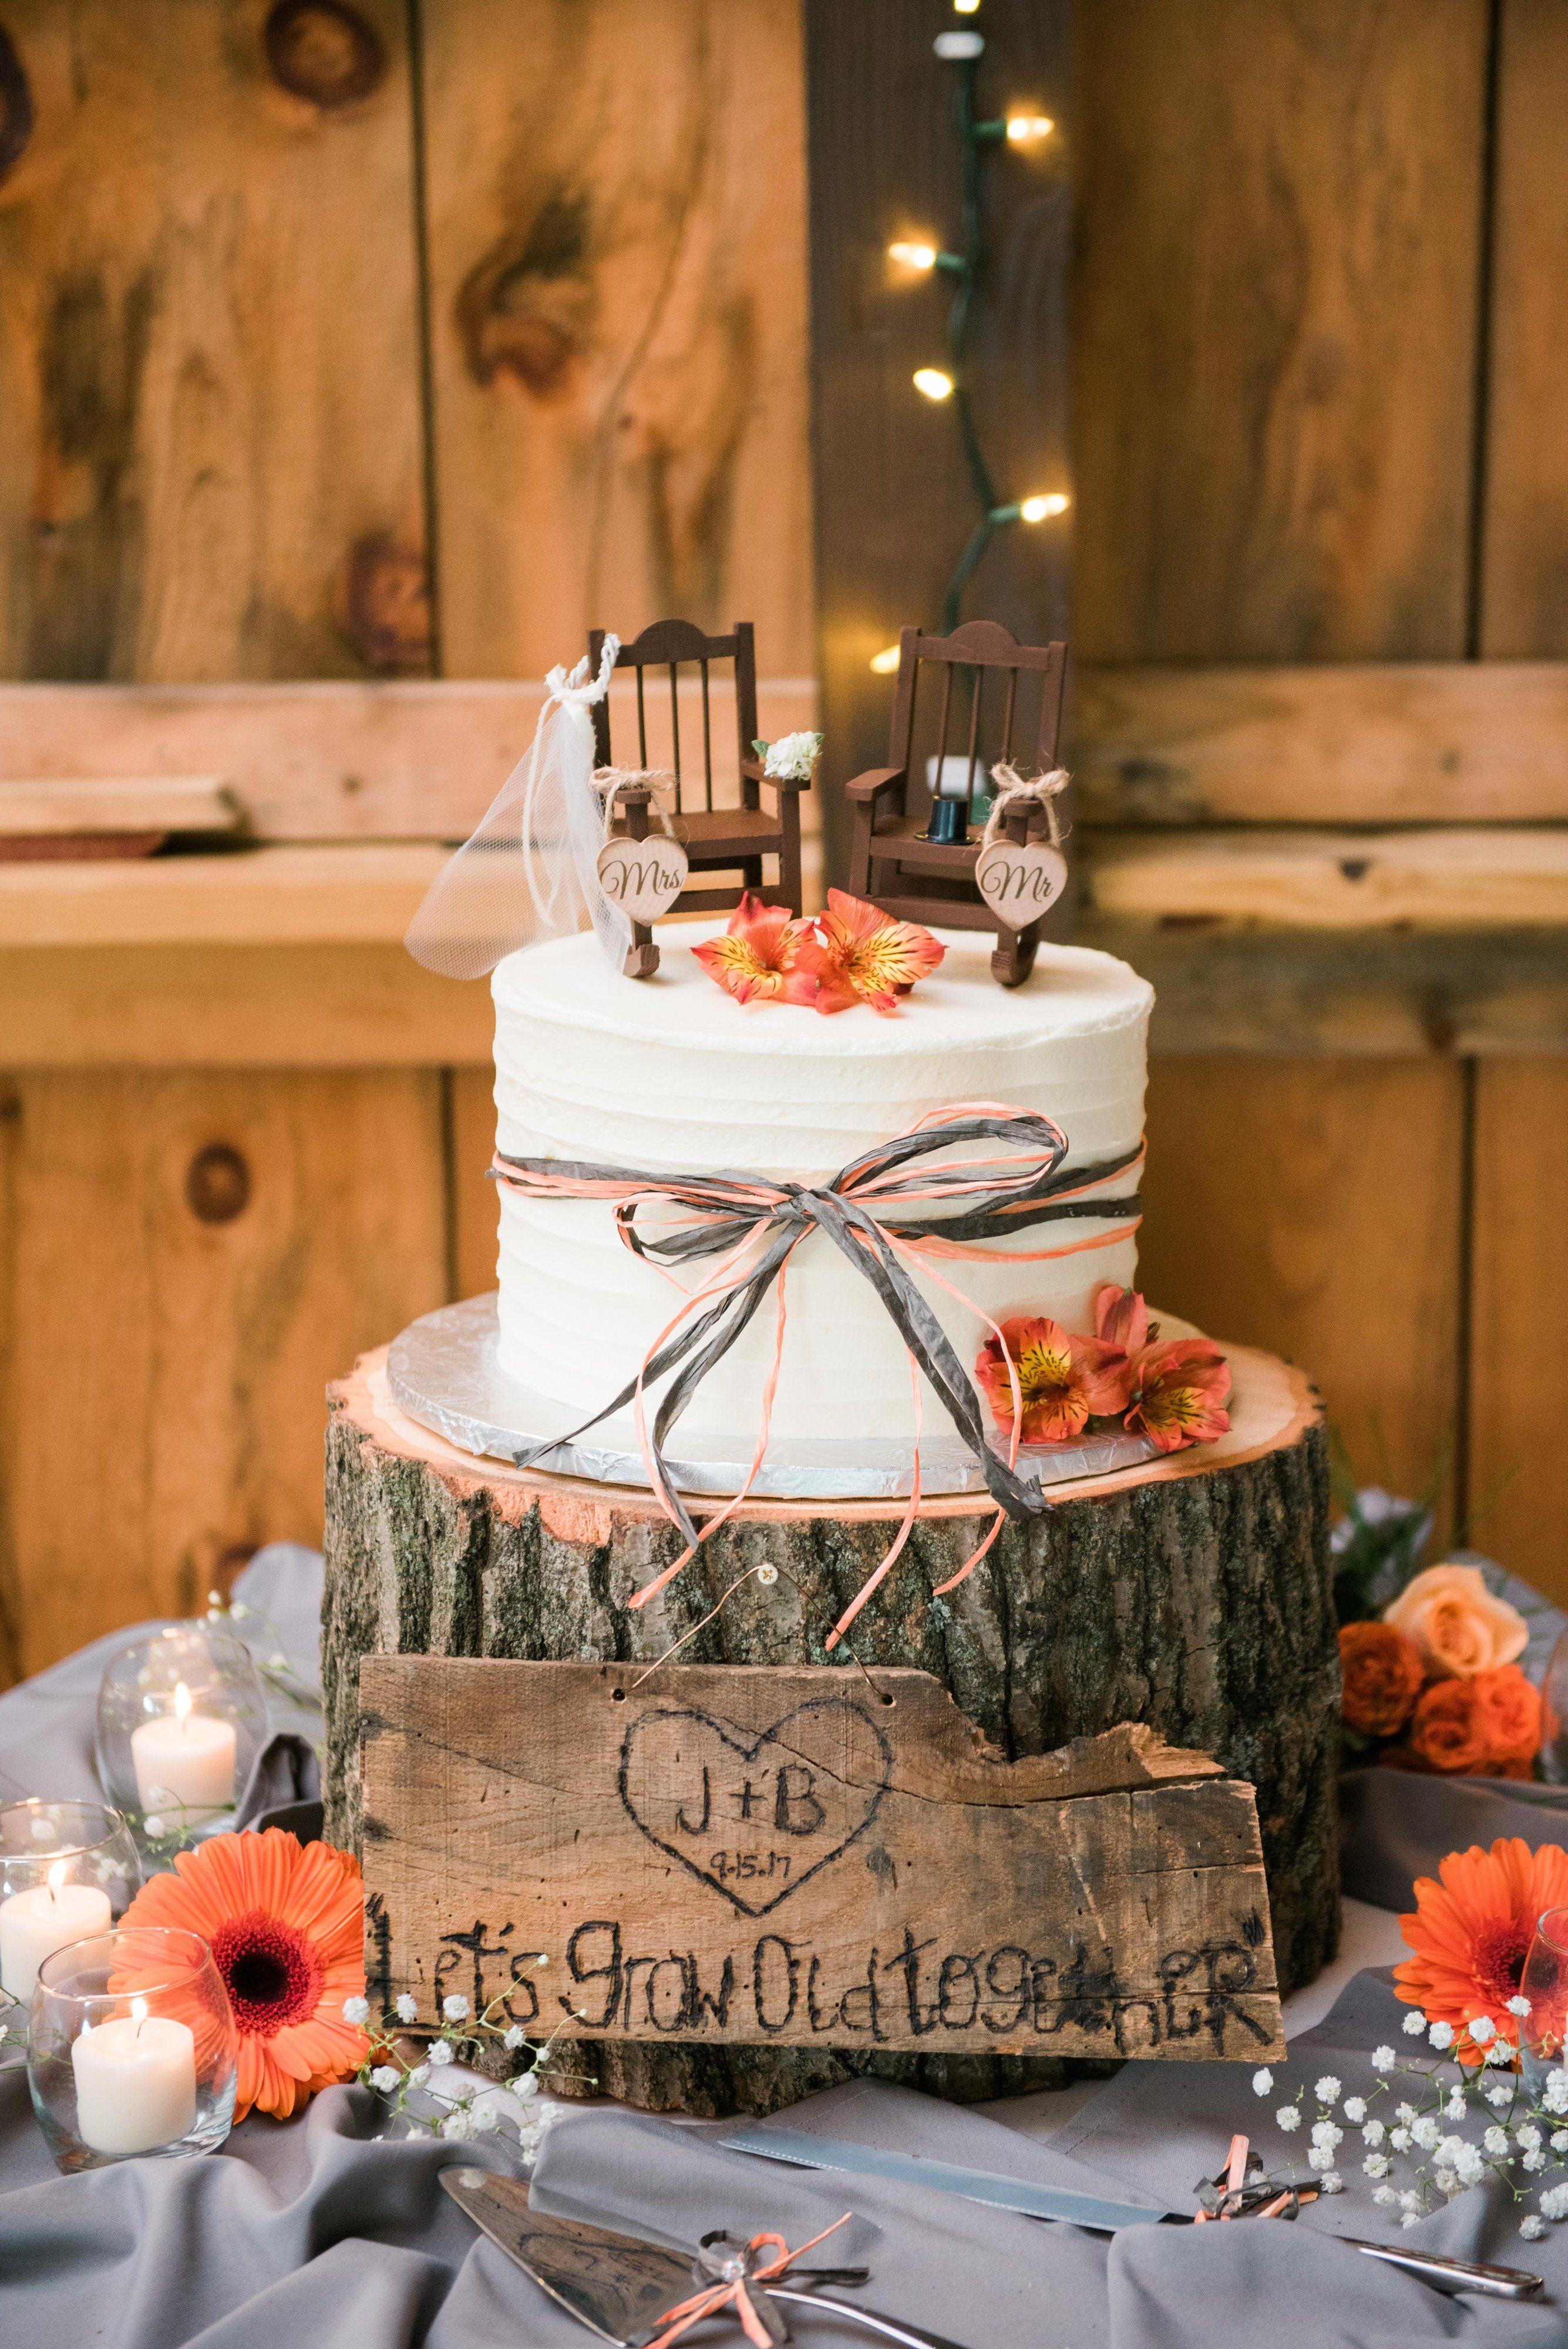 Jenn Brad Wedding Themes Rustic Wedding Cake Rustic Country